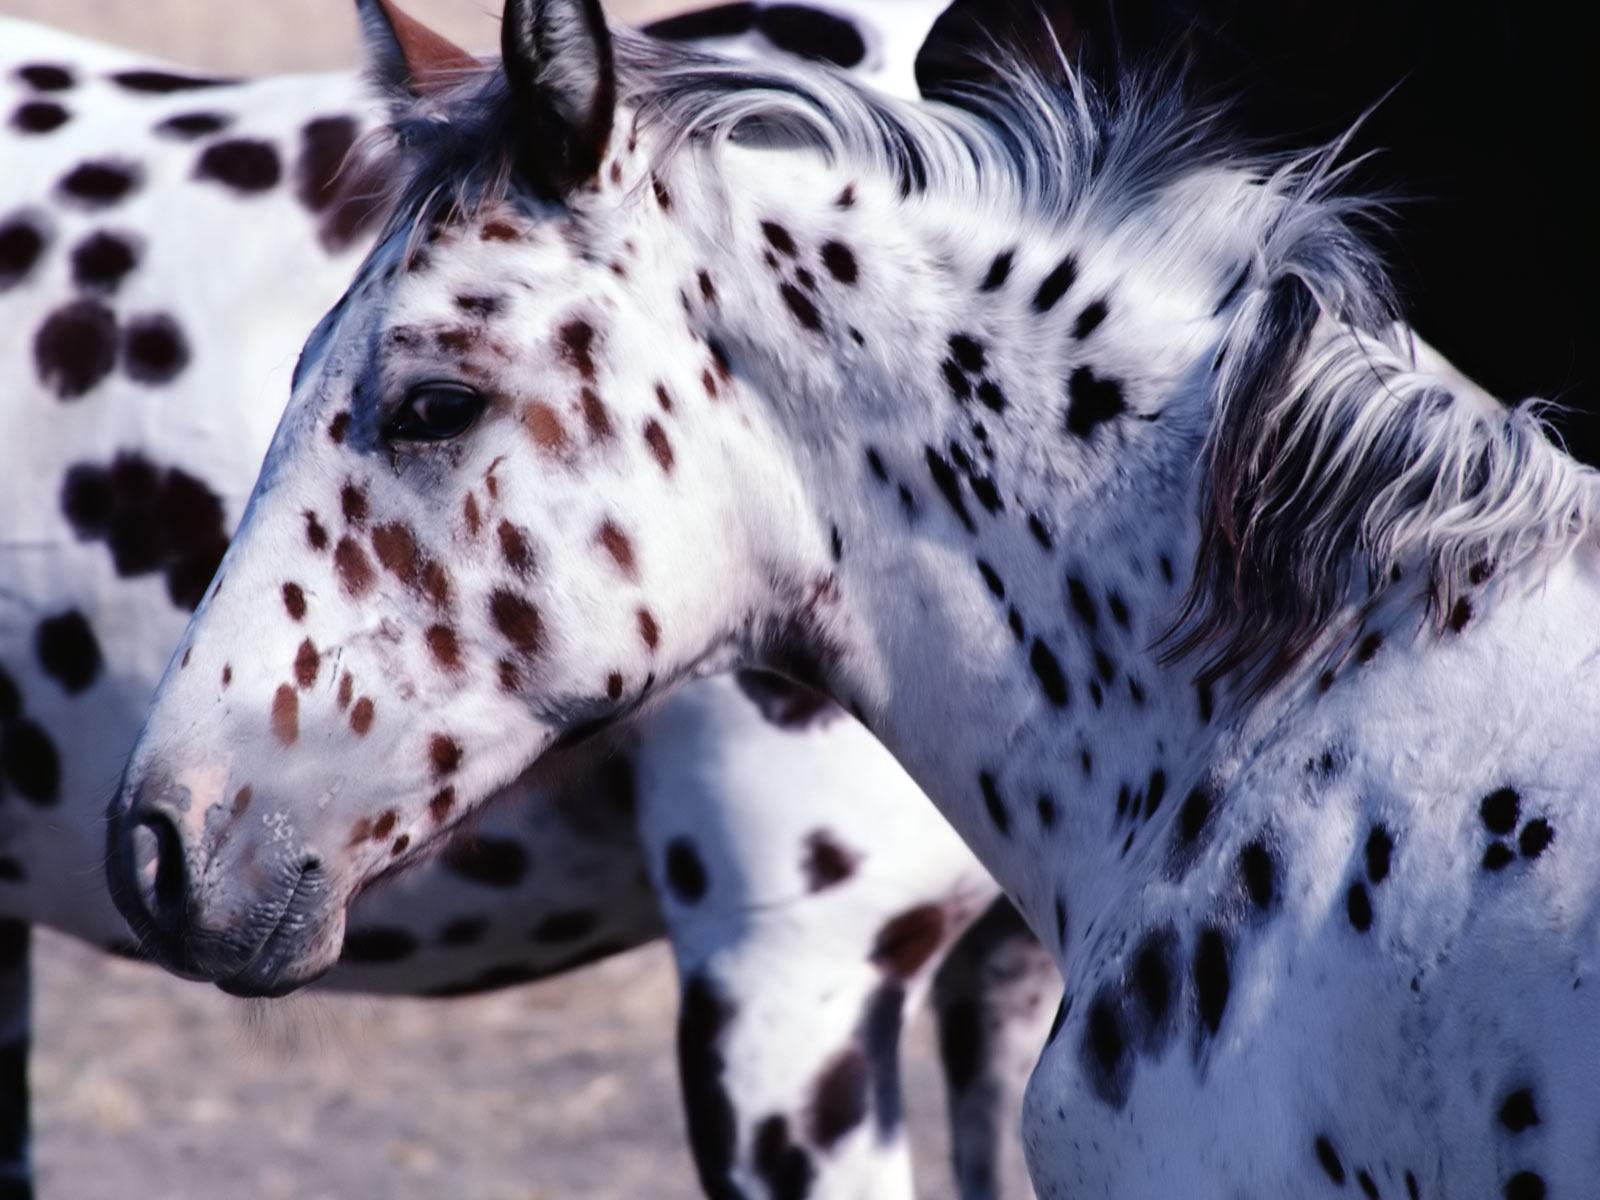 Daniel Sierra Horses Wallpapers for Desktop Backgrounds 1600x1200